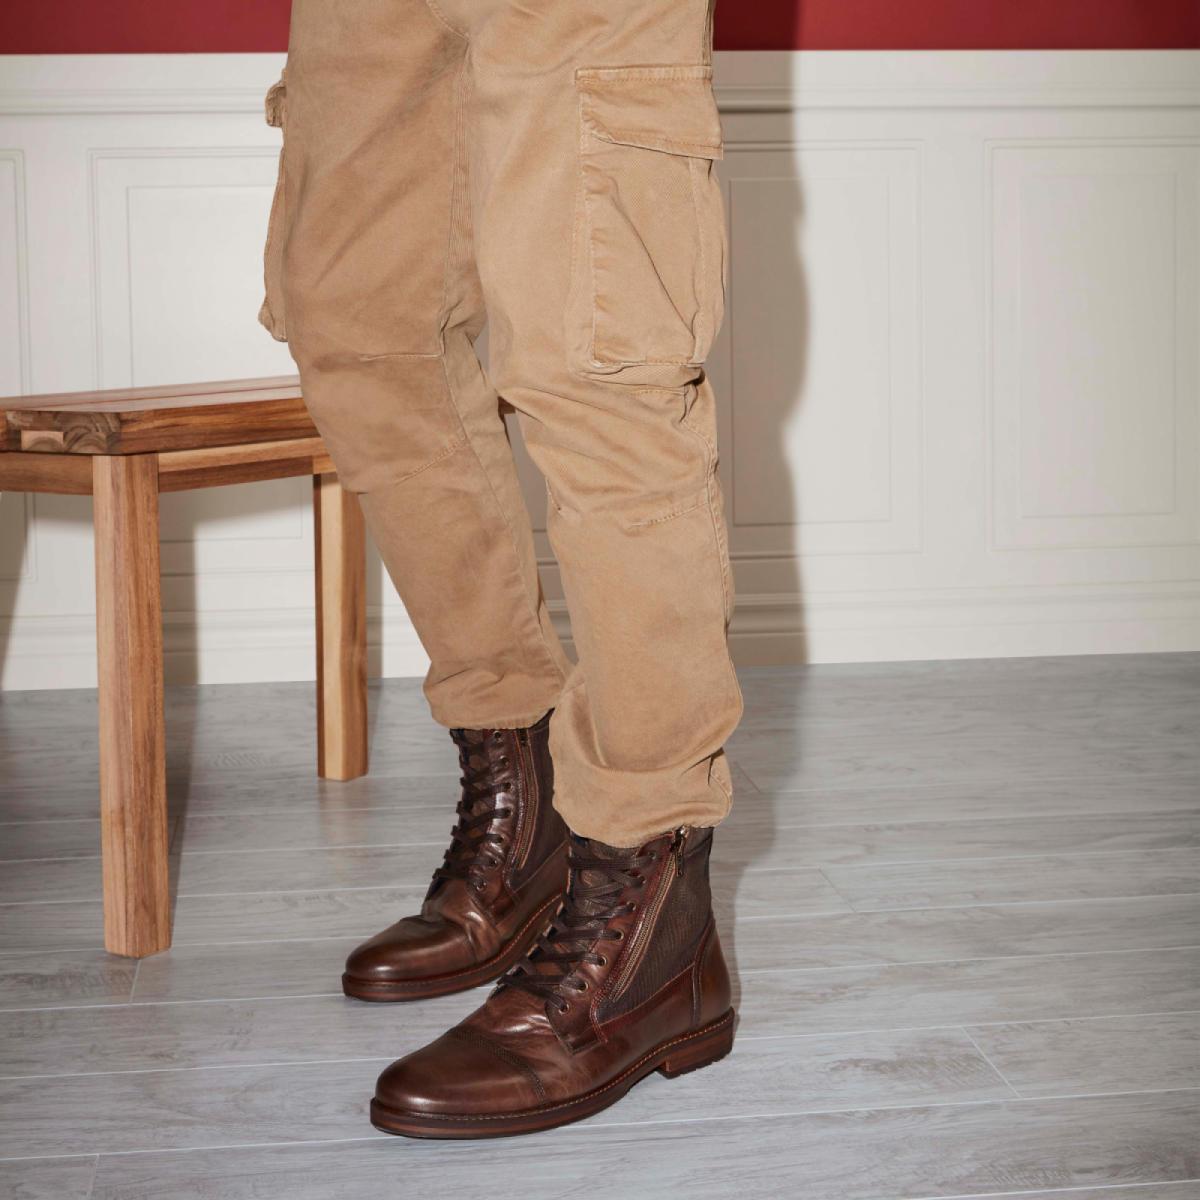 Us Cognac Lucio Men's Casual Boots wxpqzxYS0